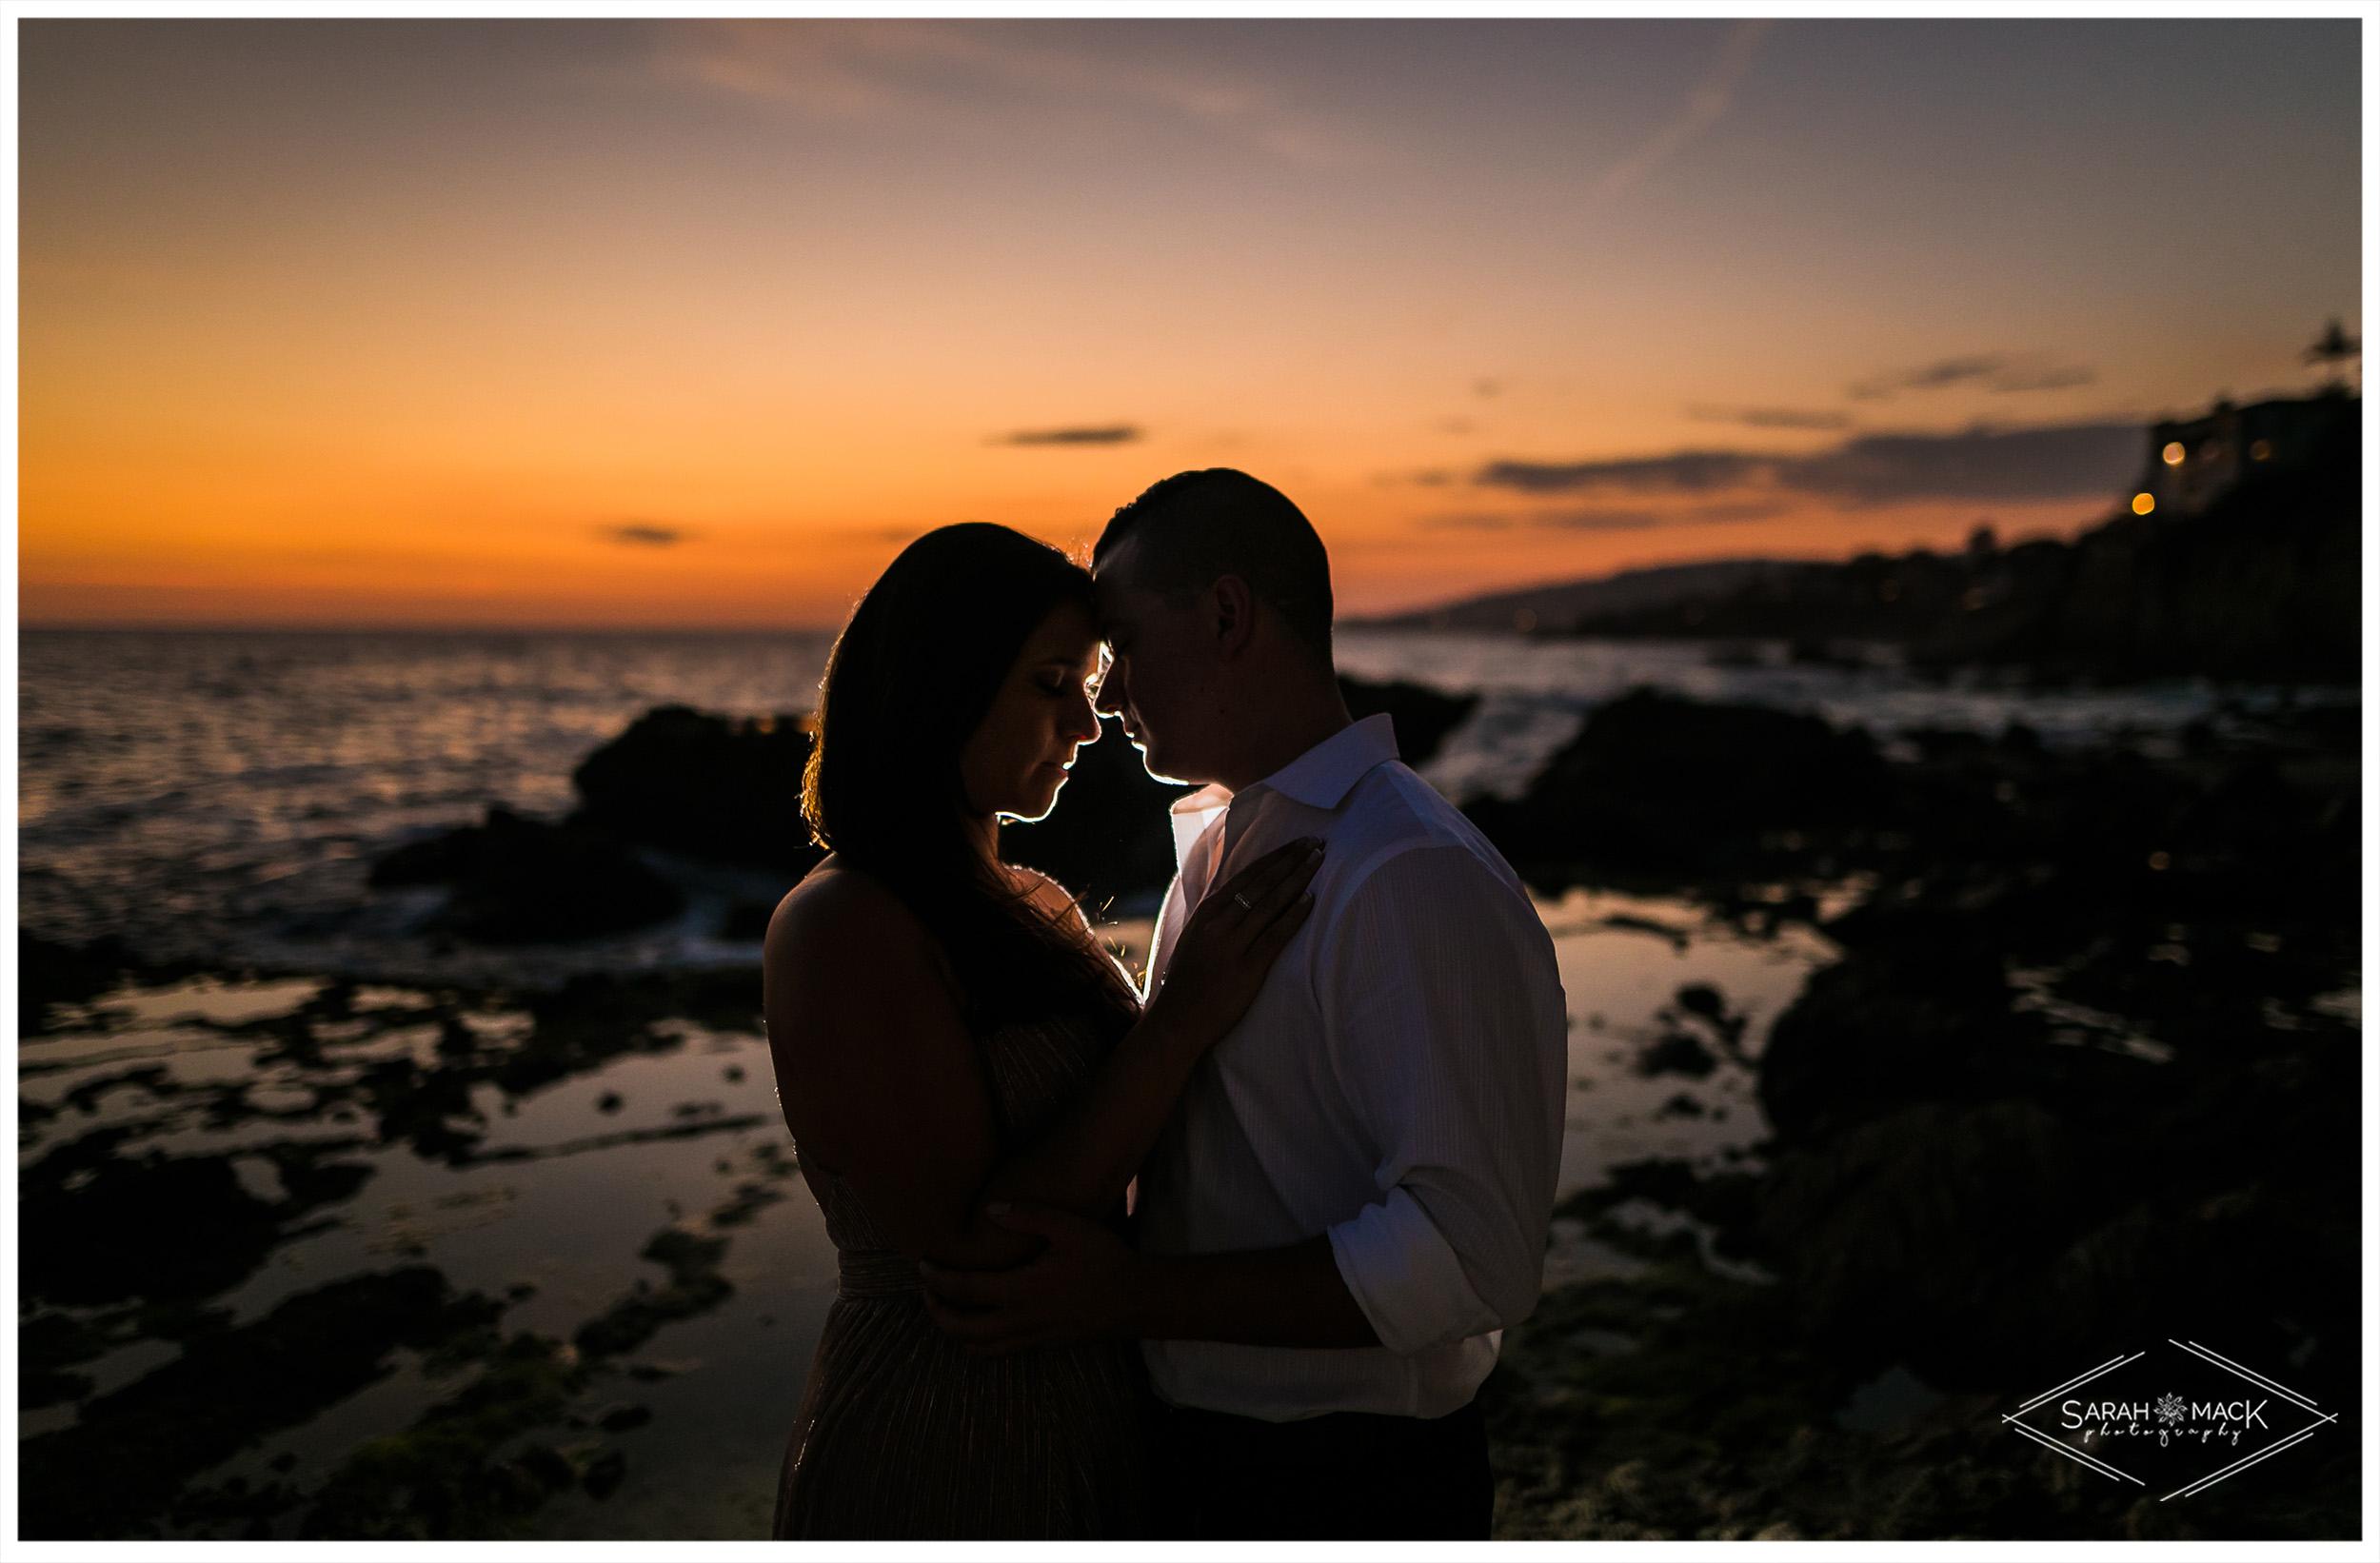 TM-Laguna-Beach-Orange-County-Engagement-Photography-22.jpg